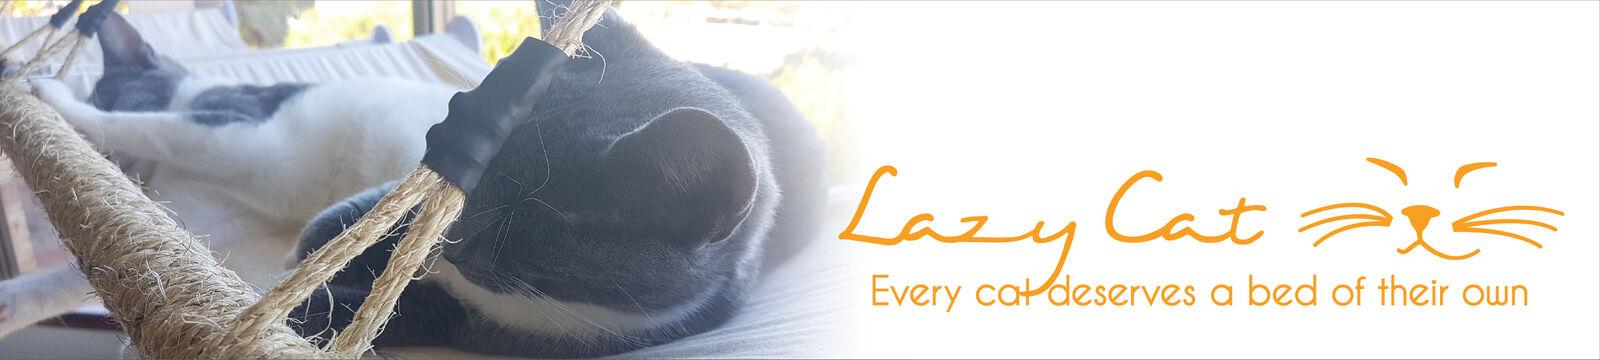 The Lazy Cat